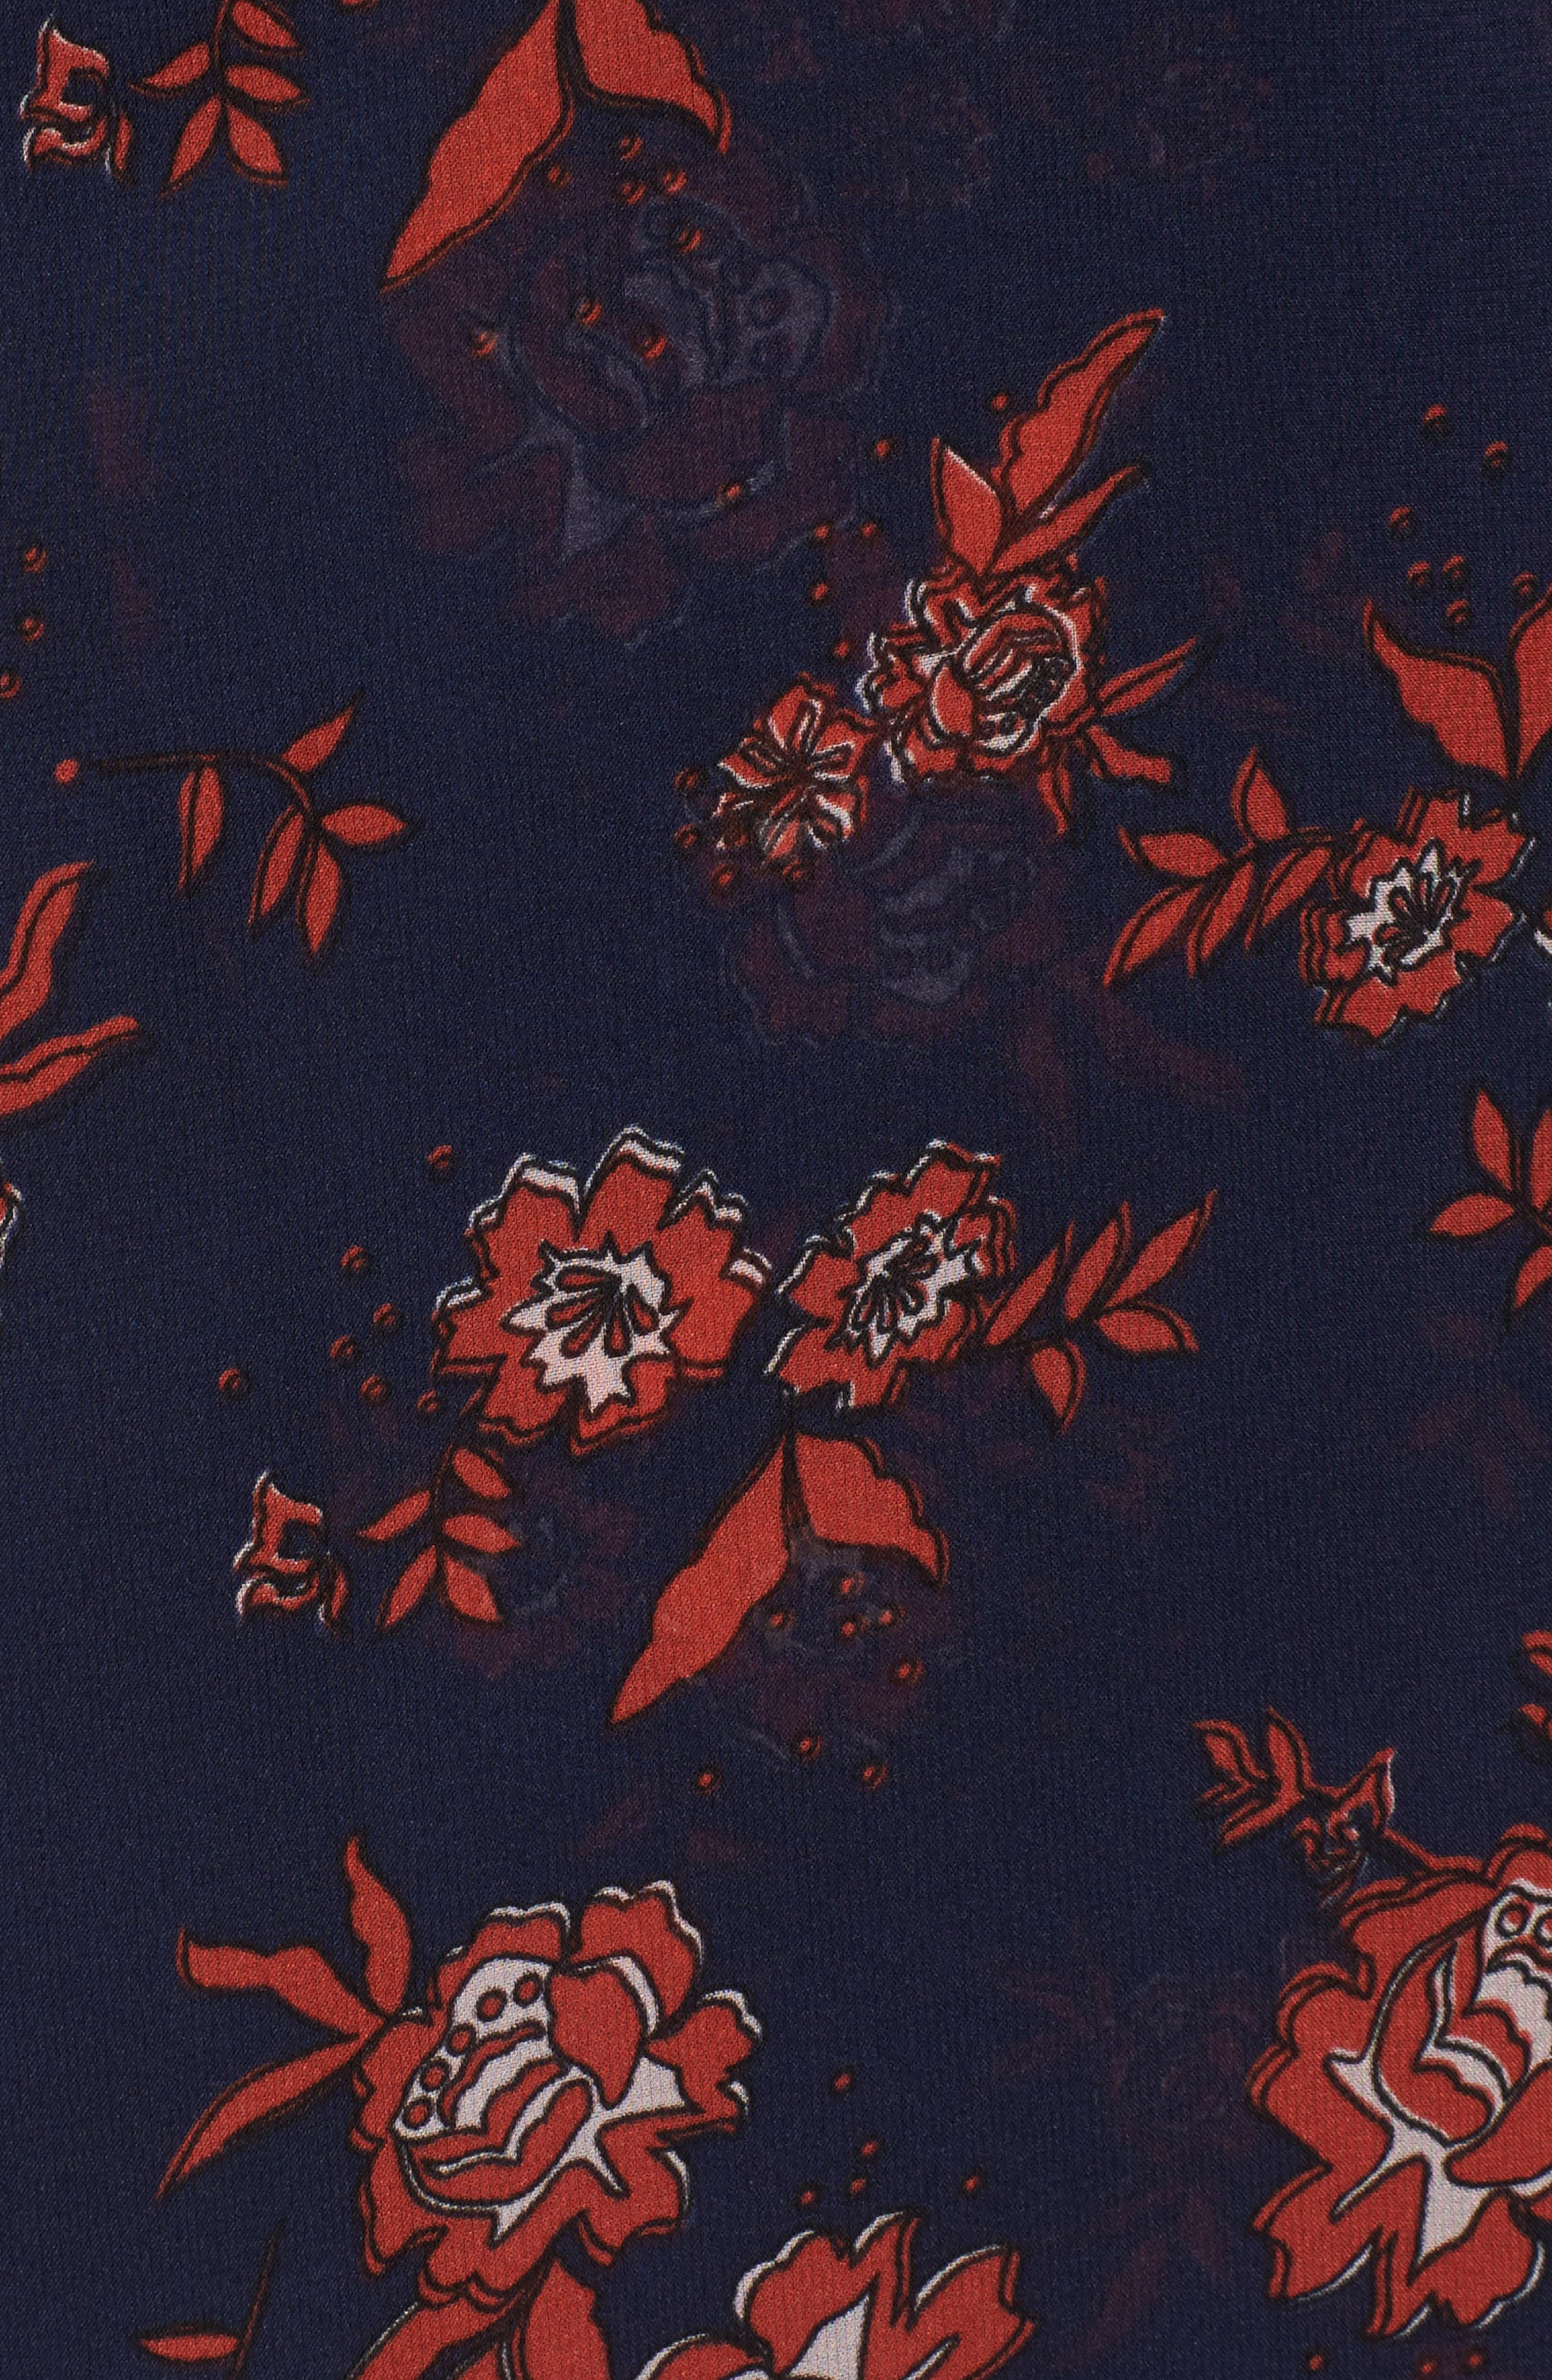 Capital Floral Wrap Maxi Dress,                             Alternate thumbnail 5, color,                             413